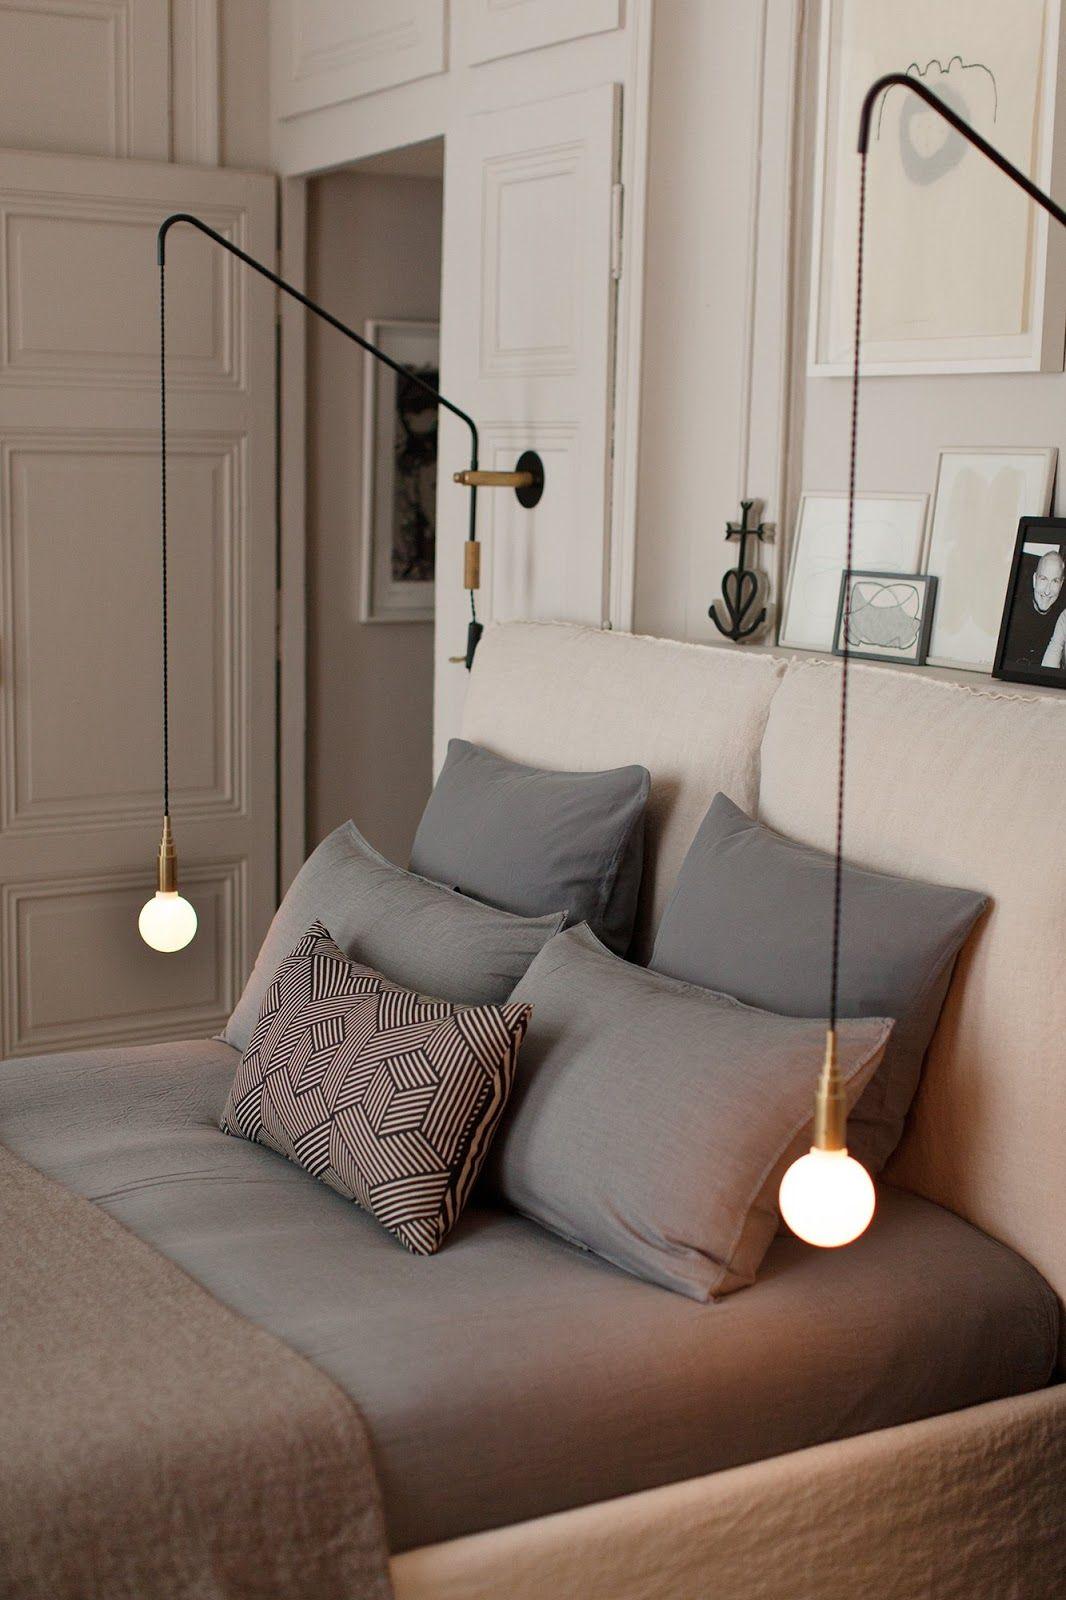 Chic apartment in lyon at home designers pierre emmanuel martin  stephane garotin of maison also best design images trends graphic rh pinterest